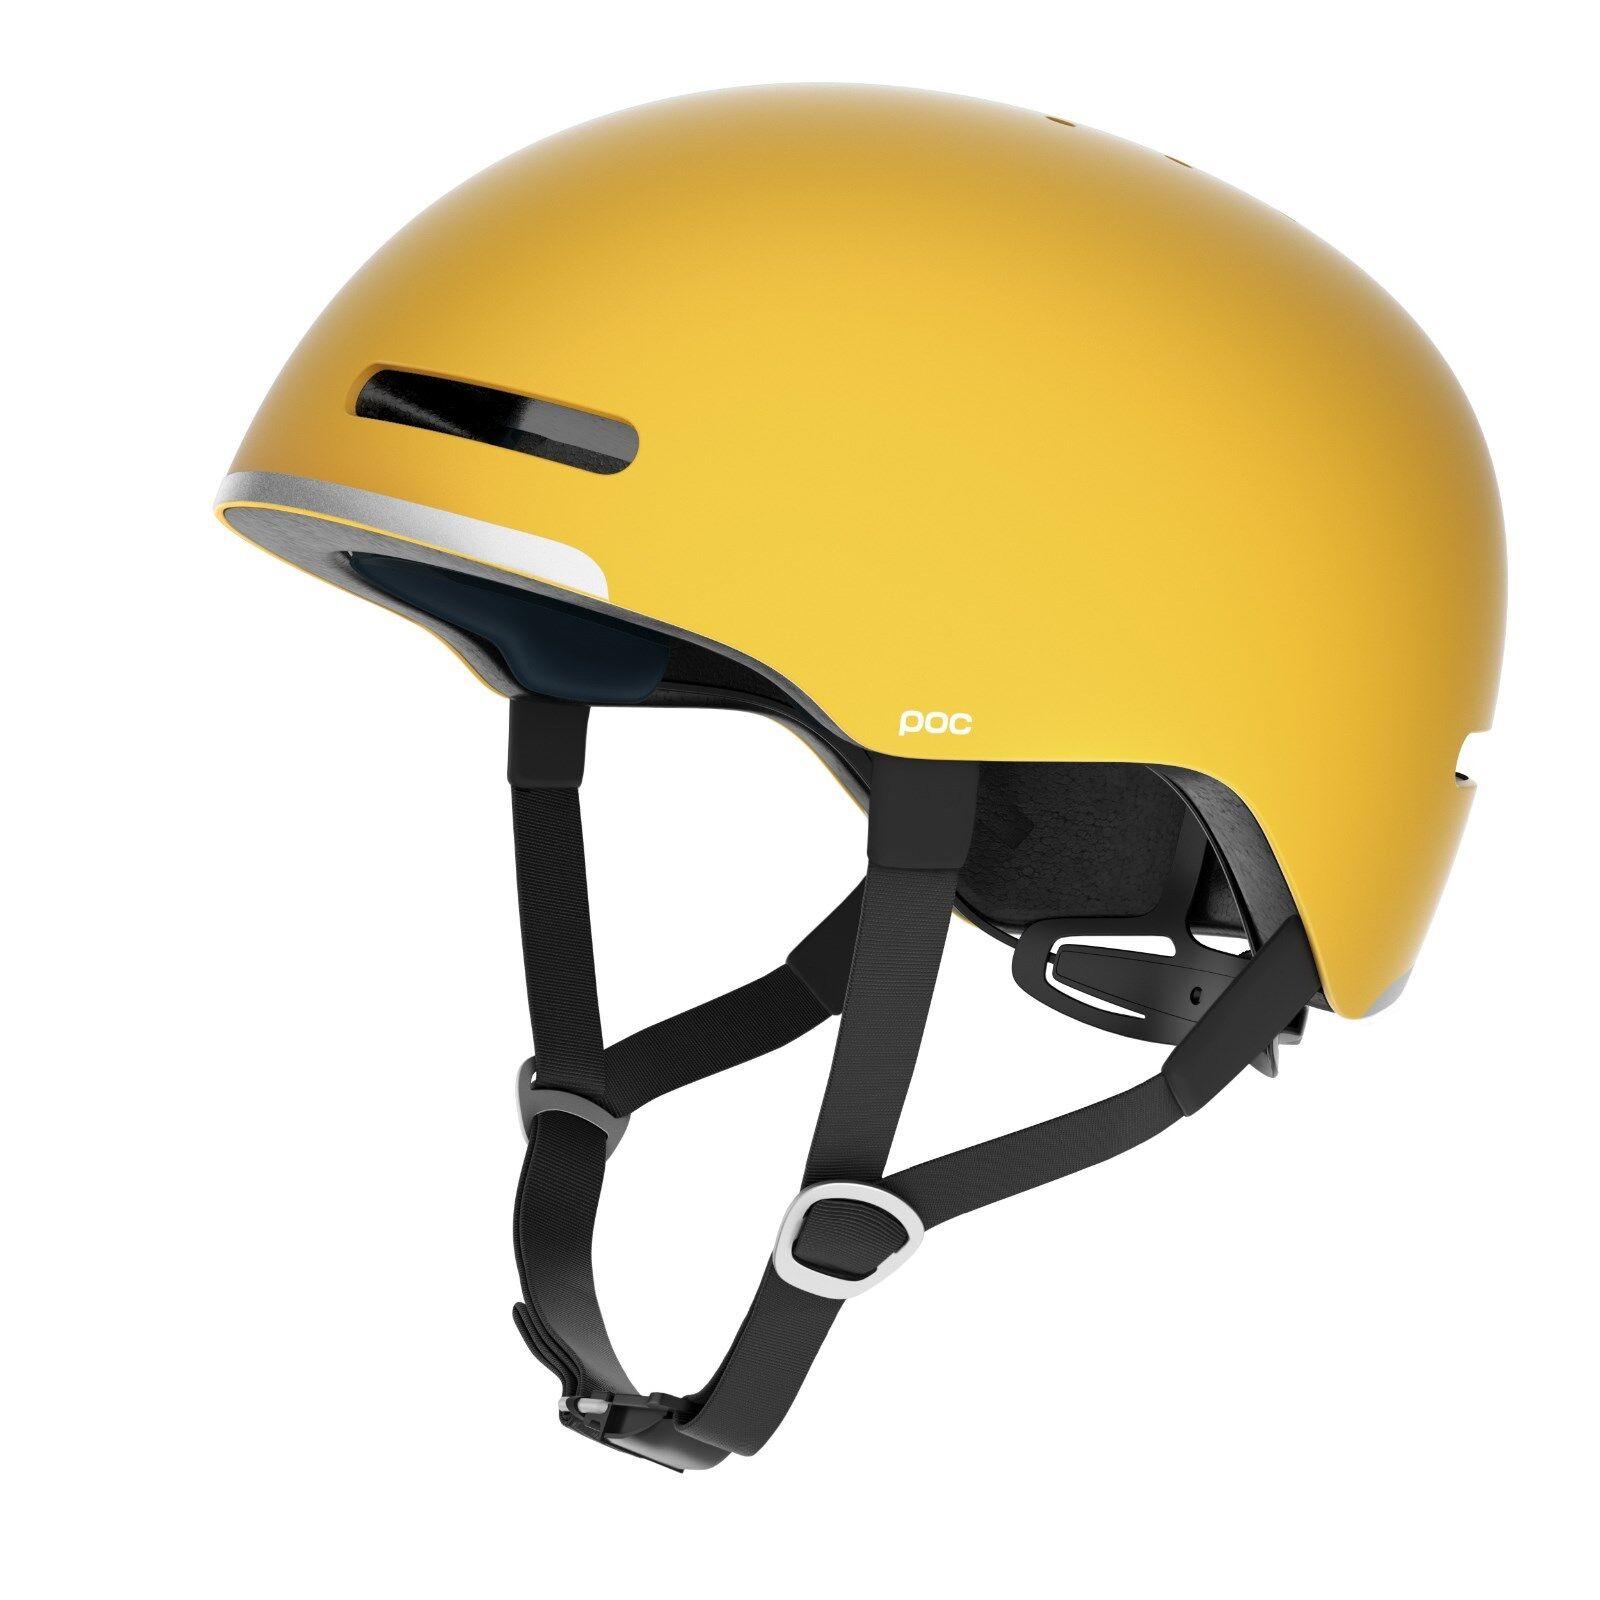 Fahrradhelm POC Corpora Sulphite Yellow  Gr. M-L NEU